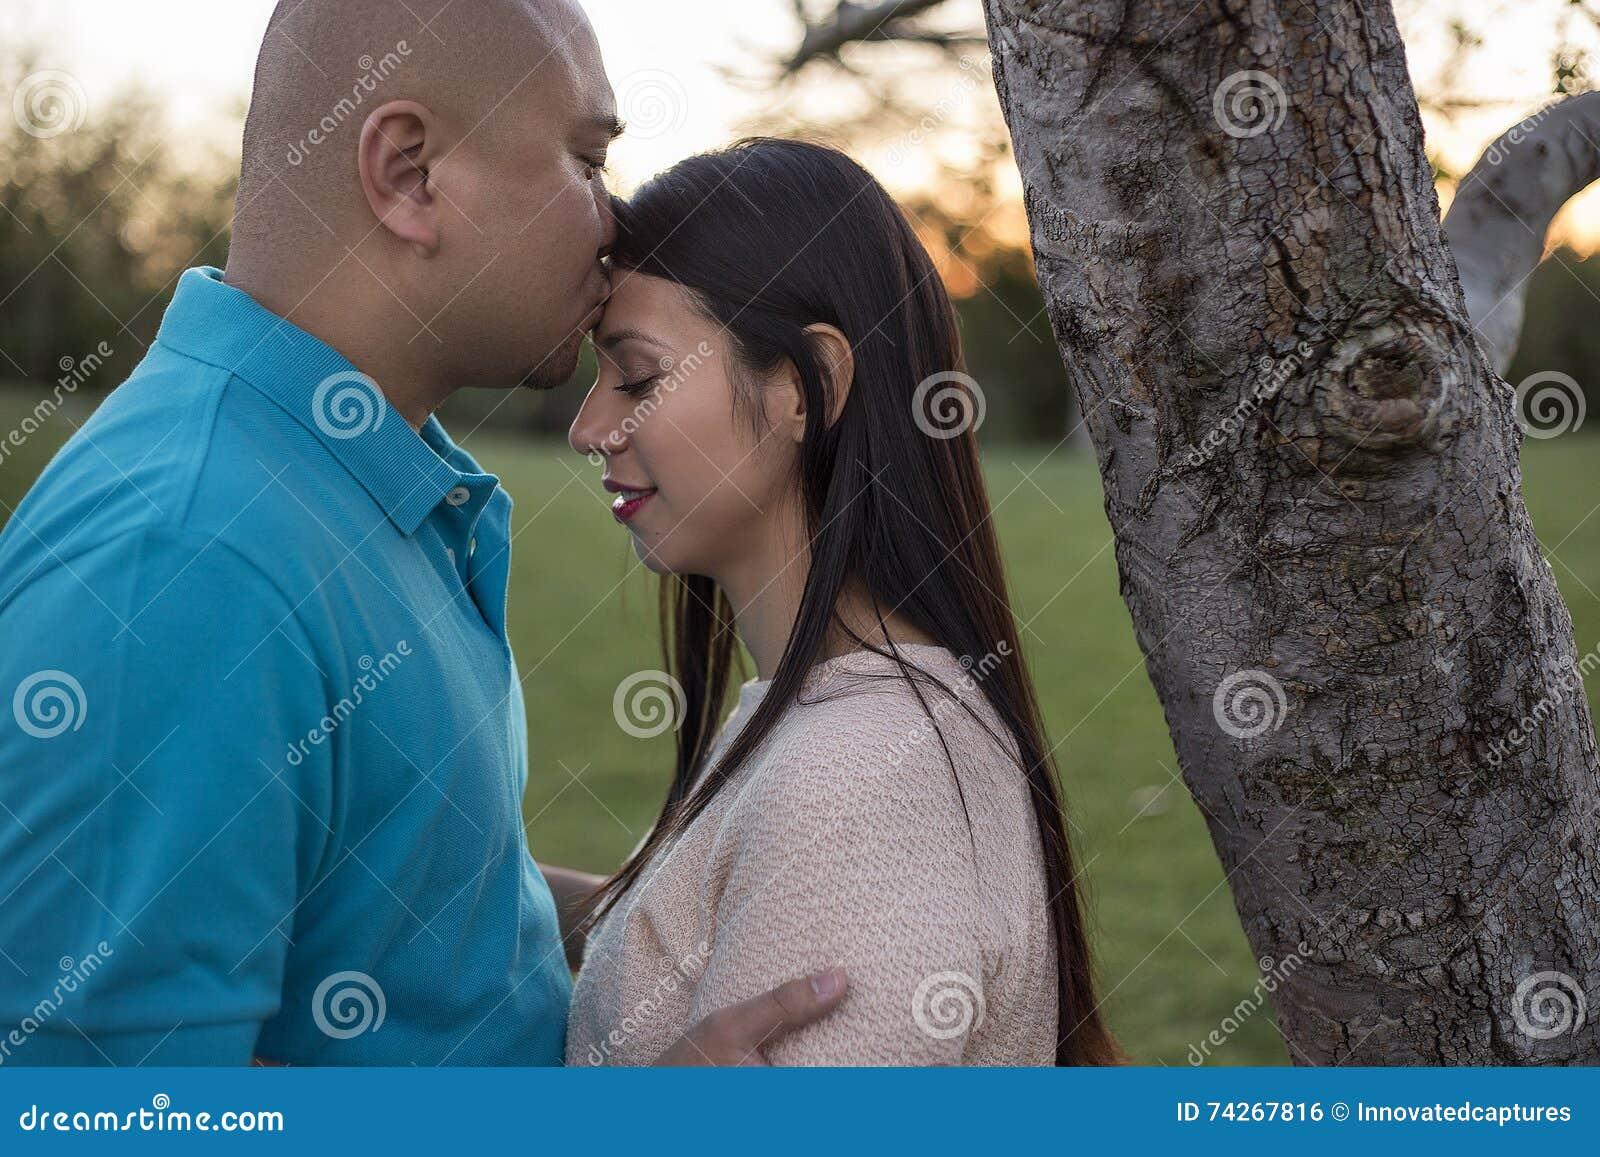 Hispanic christian dating